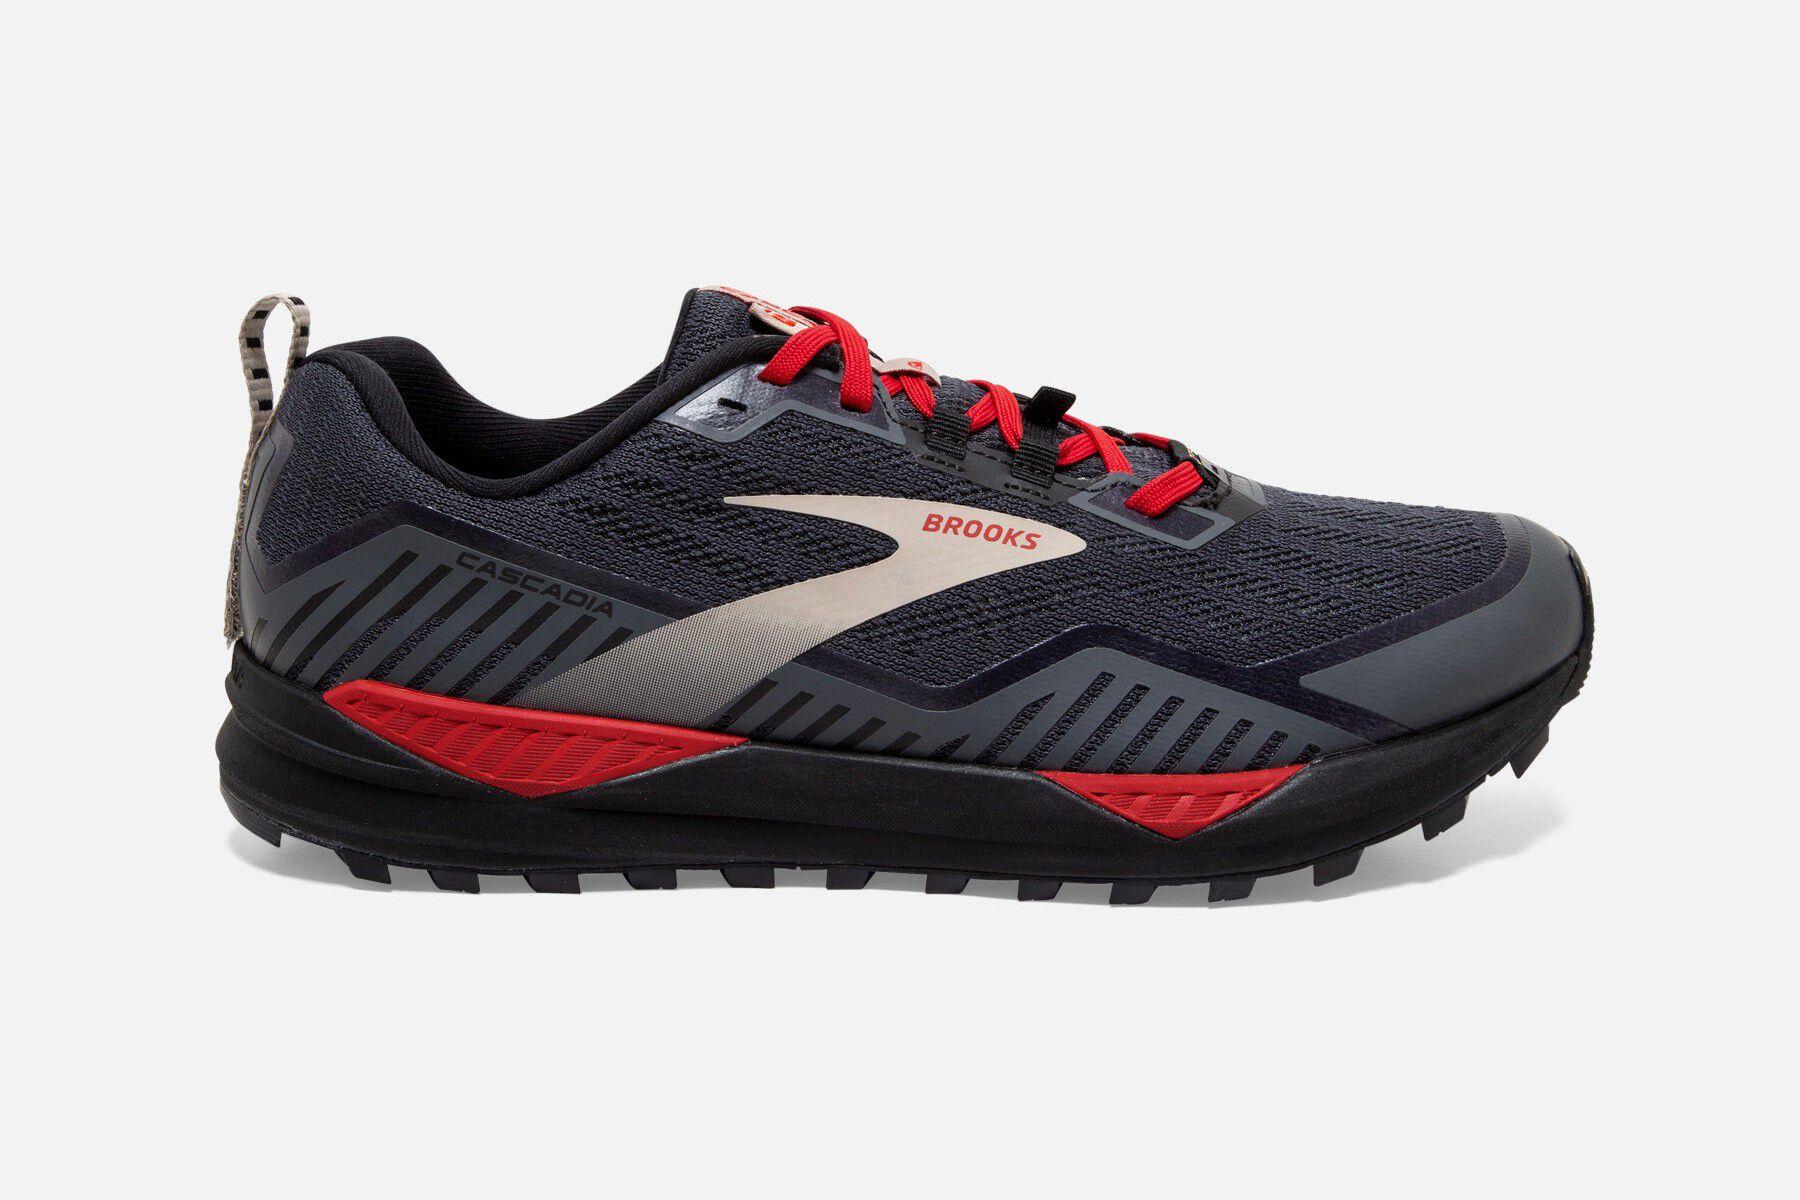 Brooks Cascadia 15 GTX | Men's Running